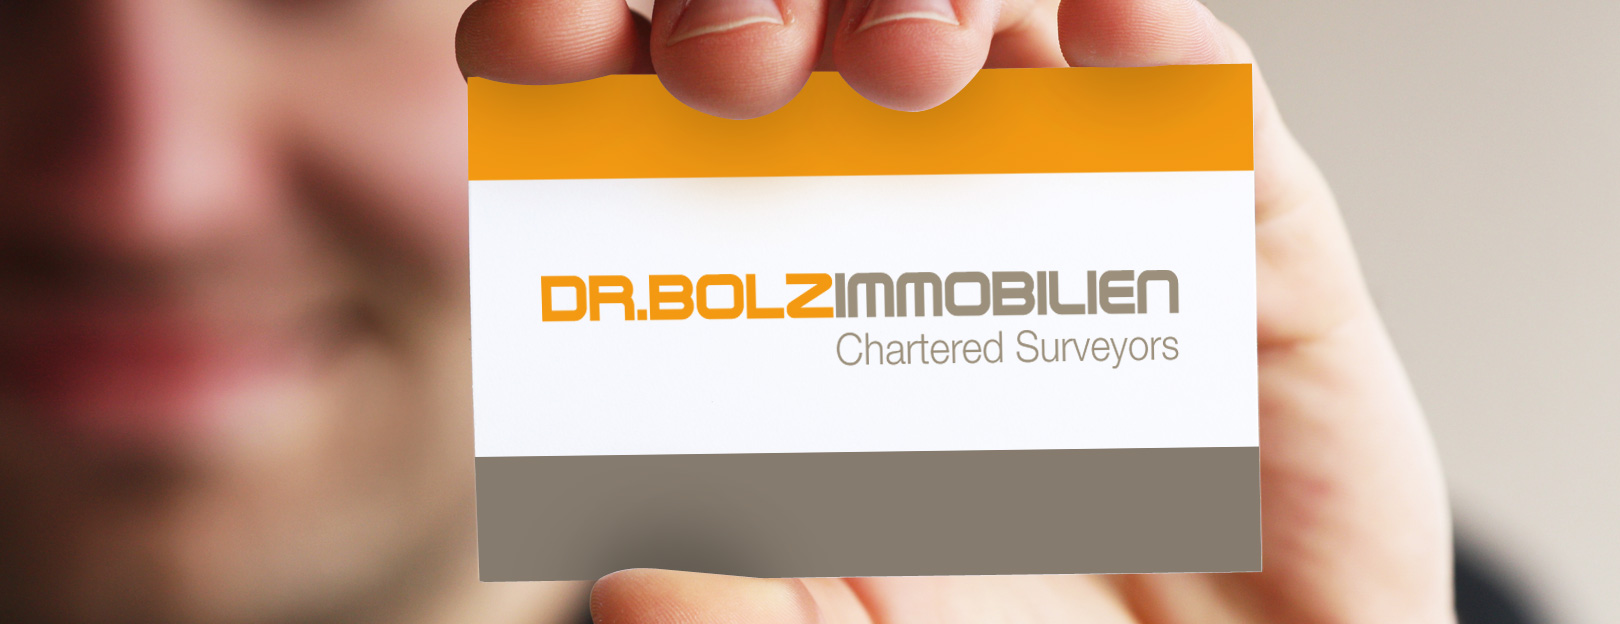 Das Prinzip Dr.Bolz - Dr. Bolz Immobilien